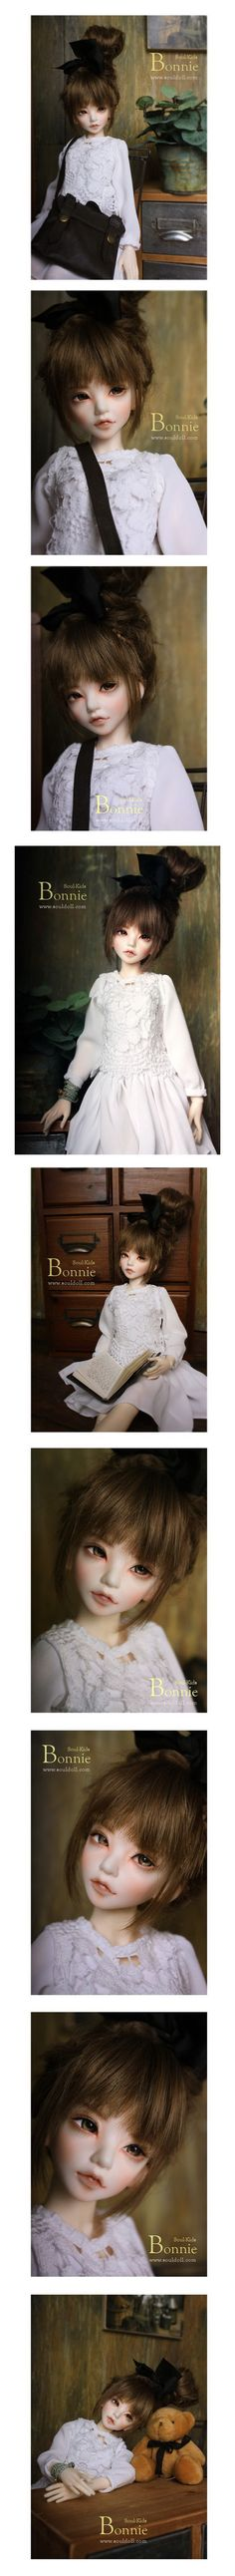 Bonnie 43cm, Soul Doll - BJD Dolls, Accessories - Alice's Collections